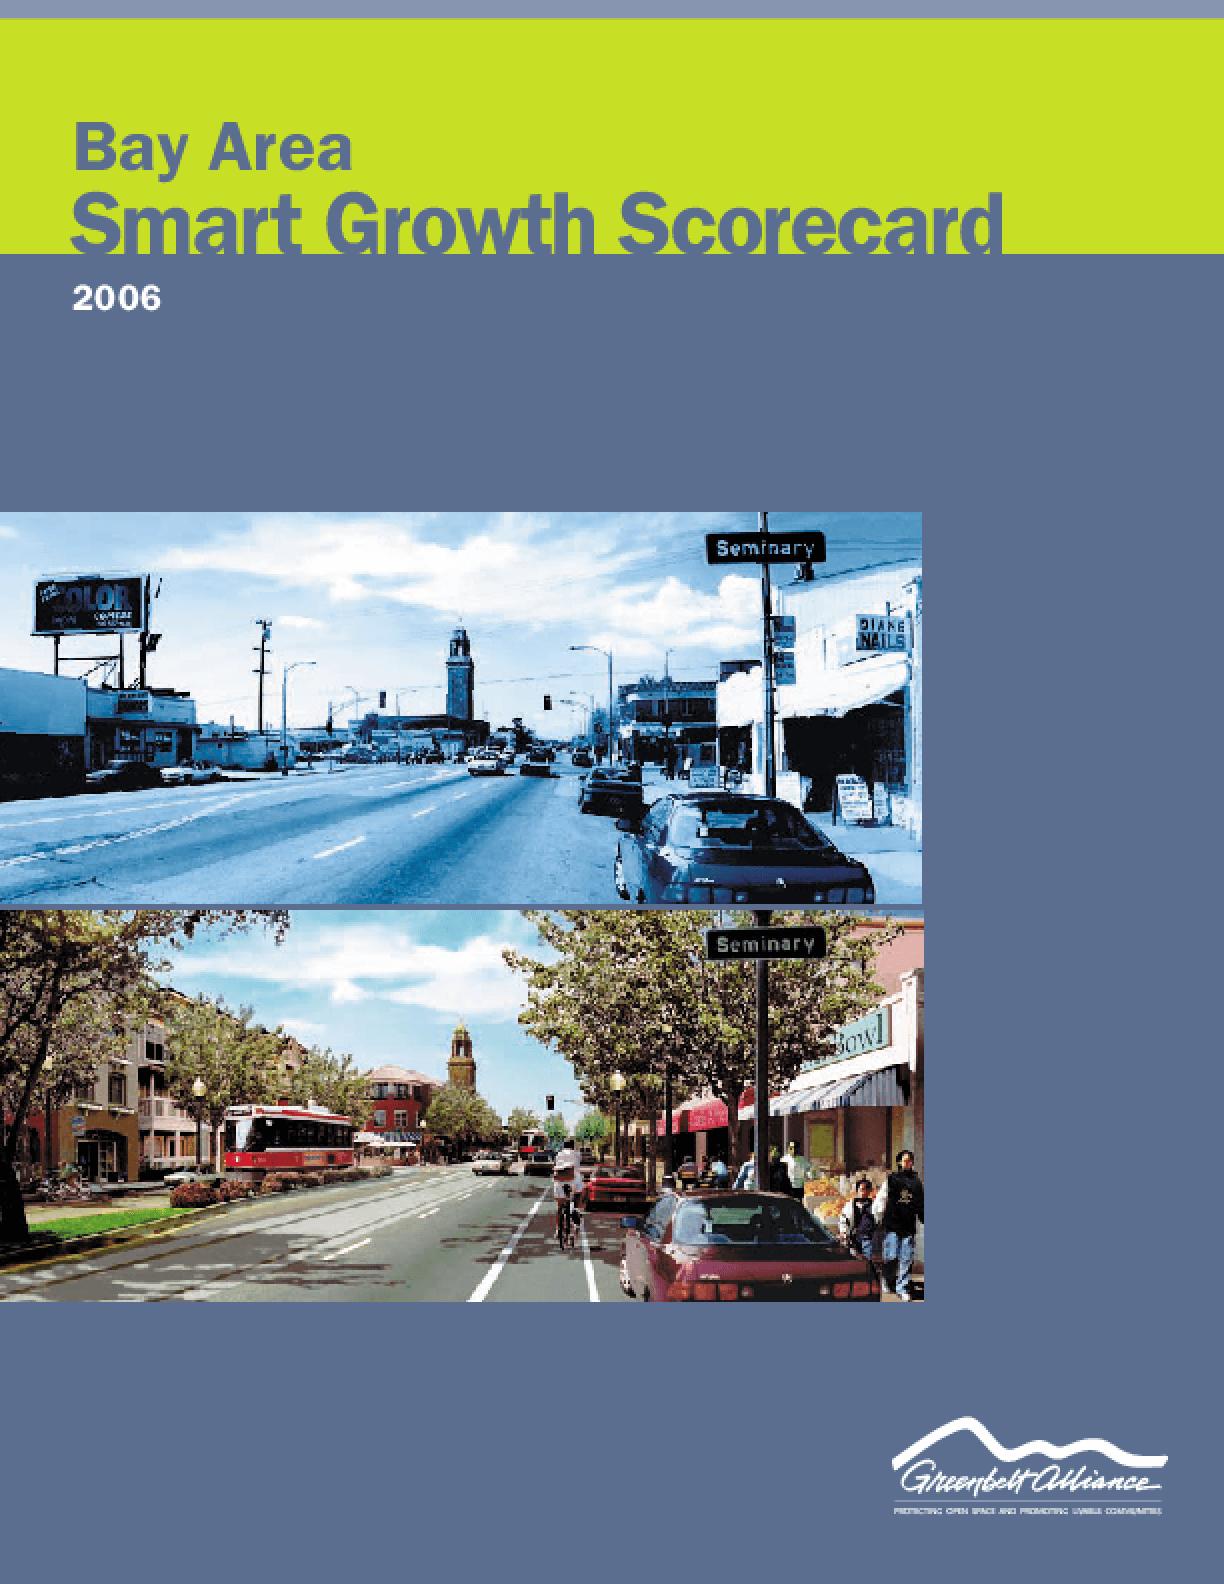 Bay Area Smart Growth Scorecard